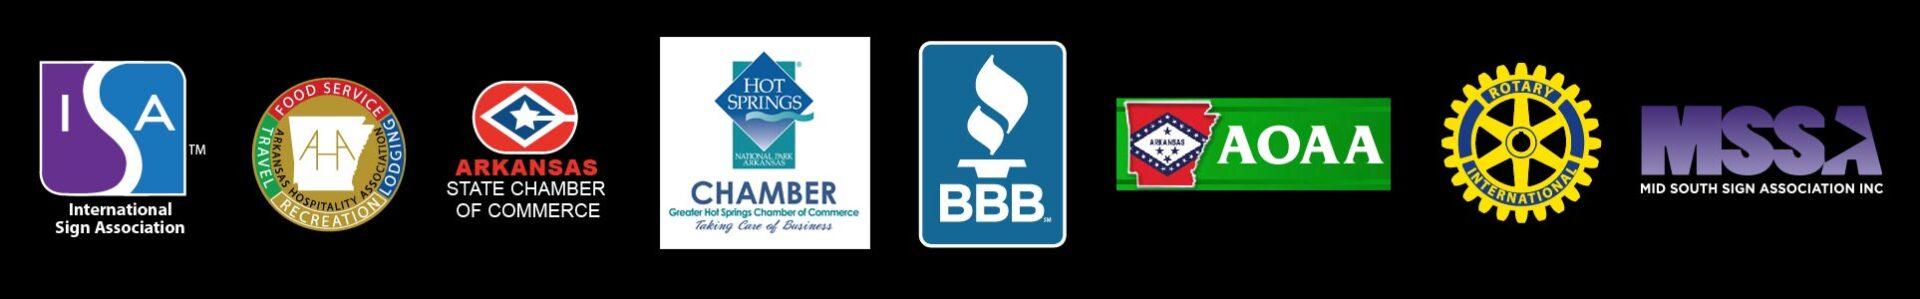 affiliations-bg2